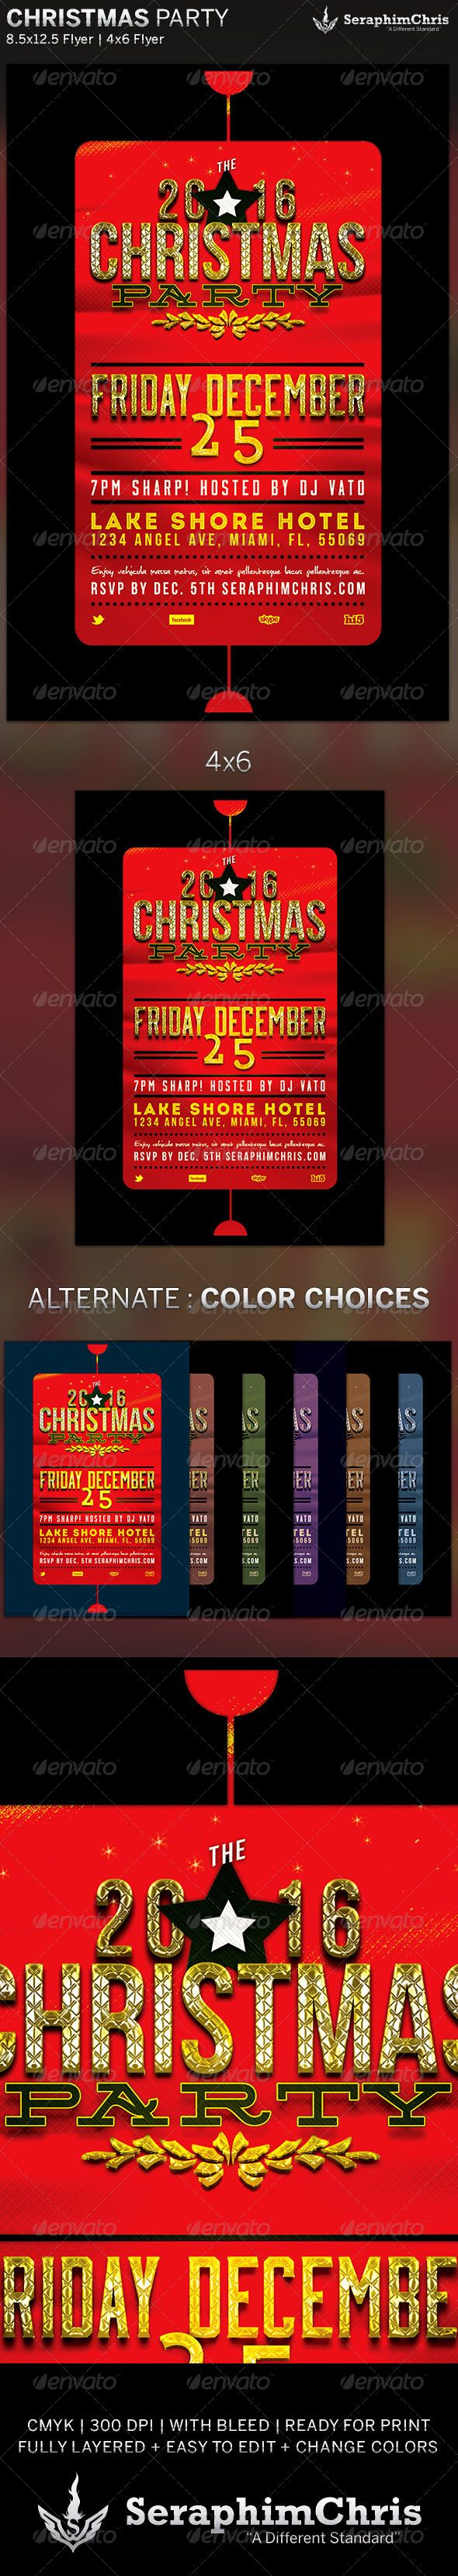 82 best print templates images on pinterest print templates